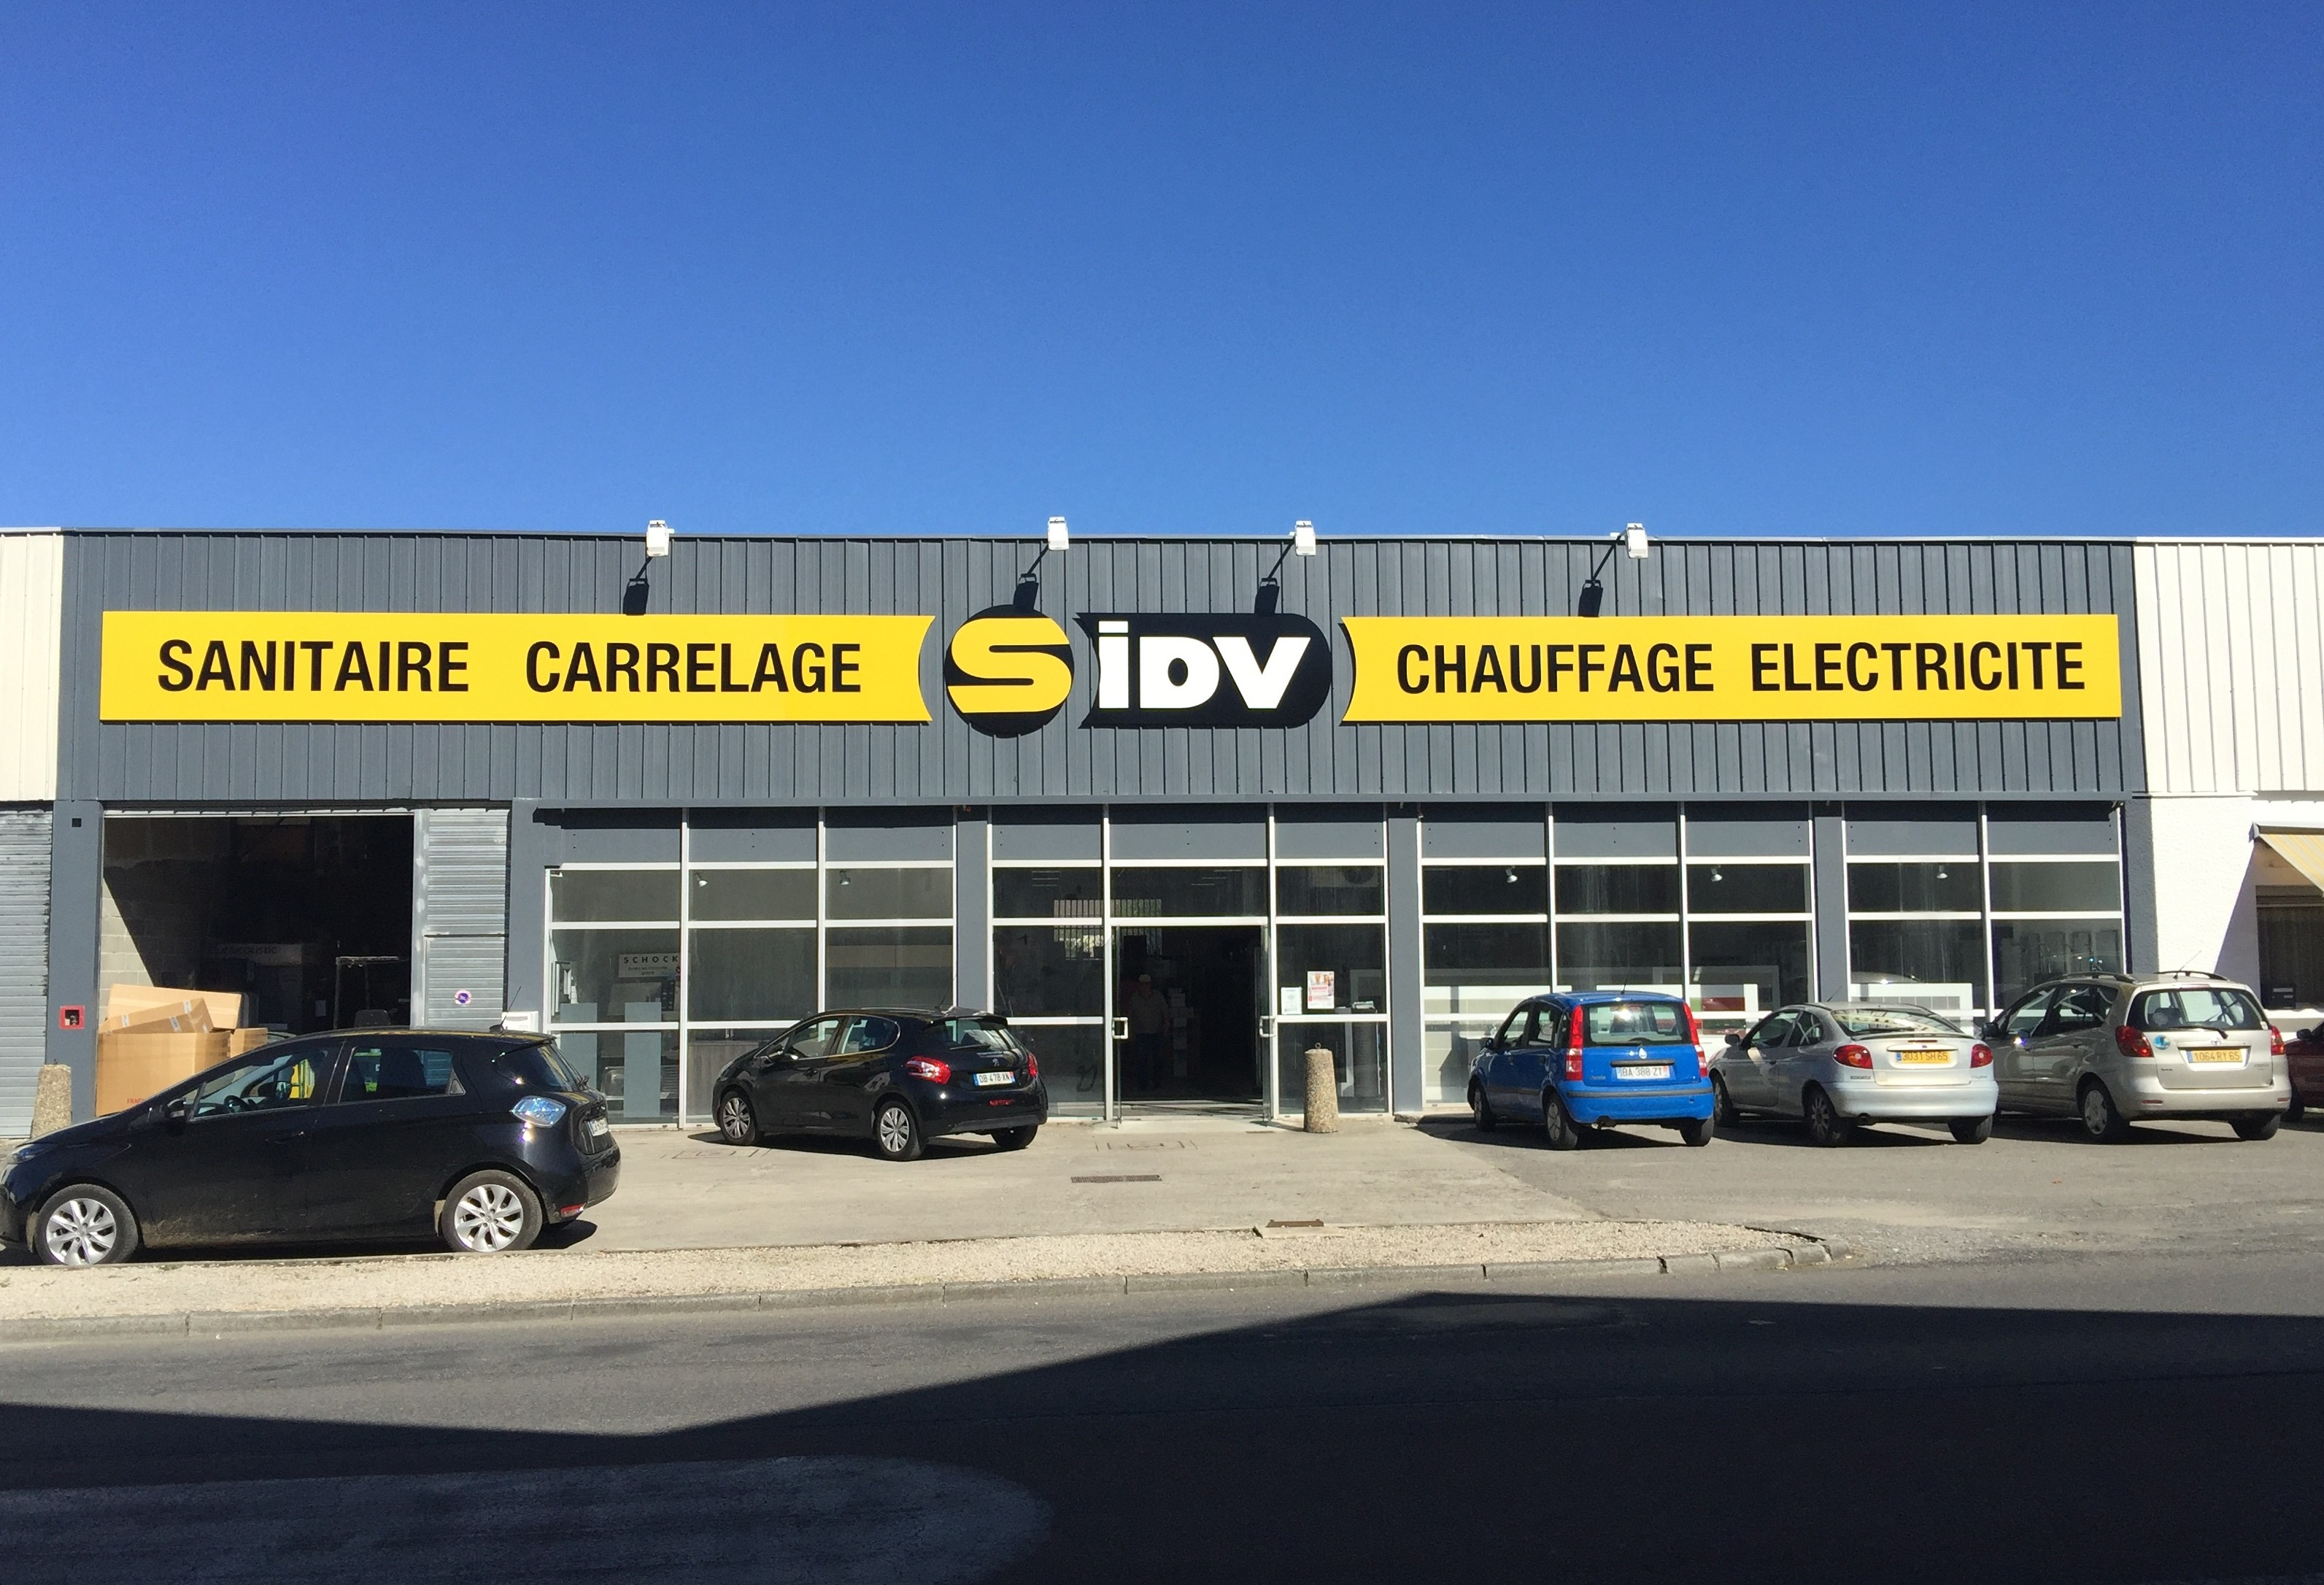 Carrelage Du Grand Sud sidv - groupe sisca | linkedin